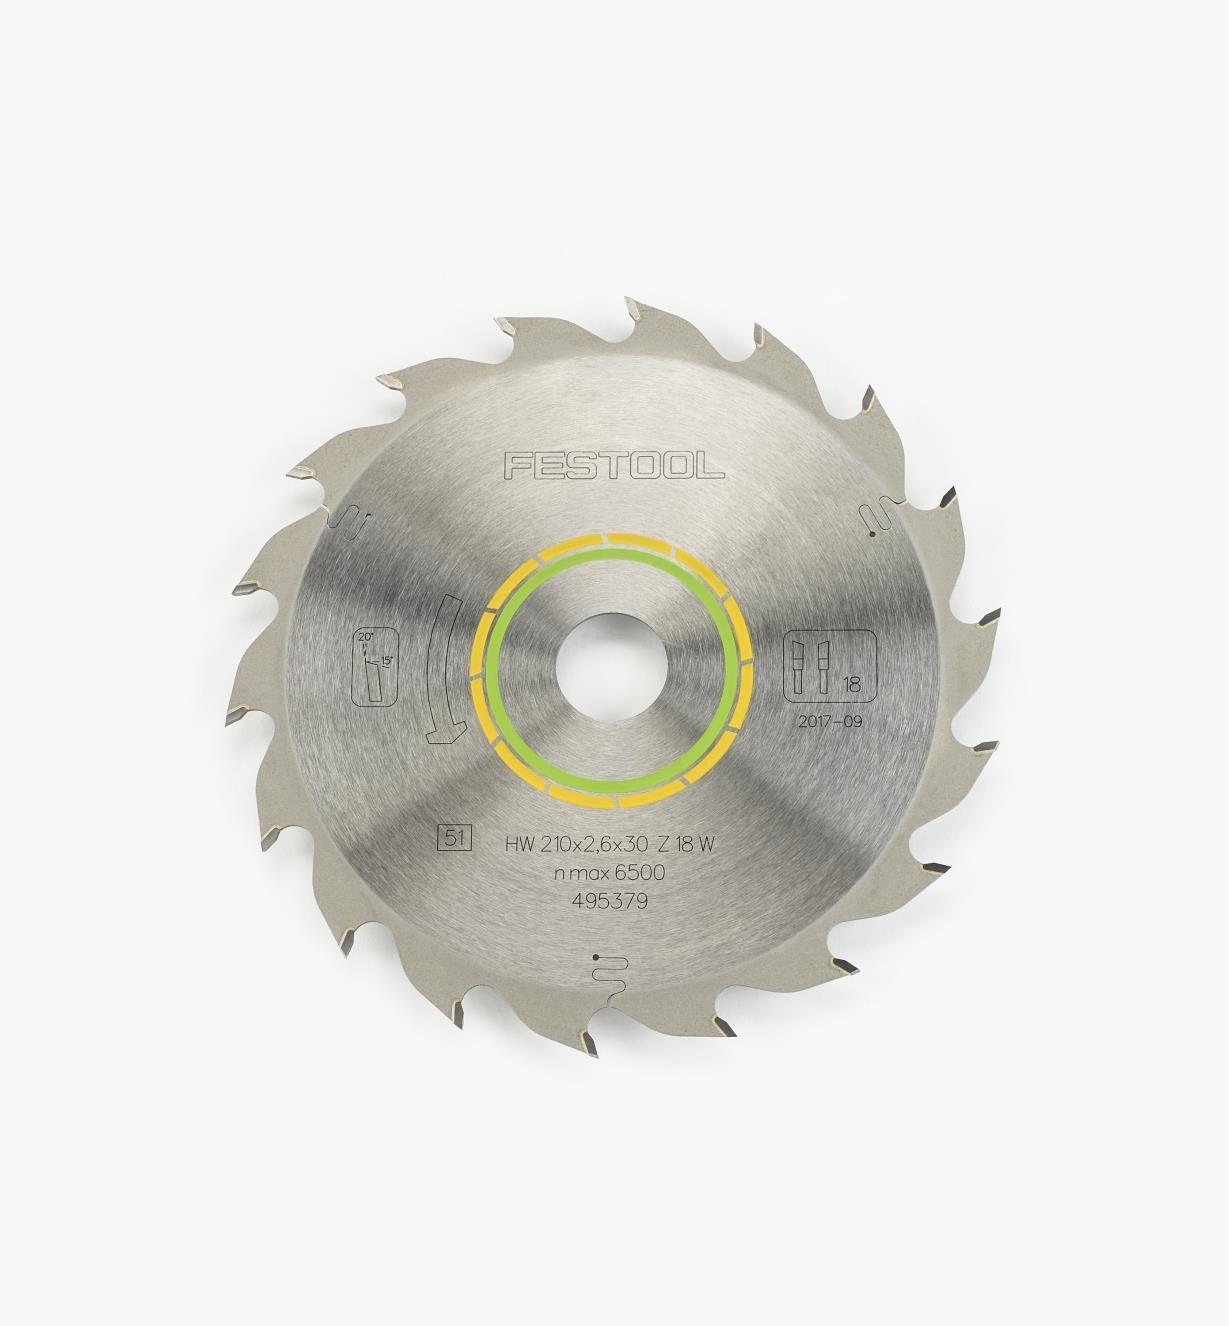 ZA495379 - Standard TS 75 Saw Blade